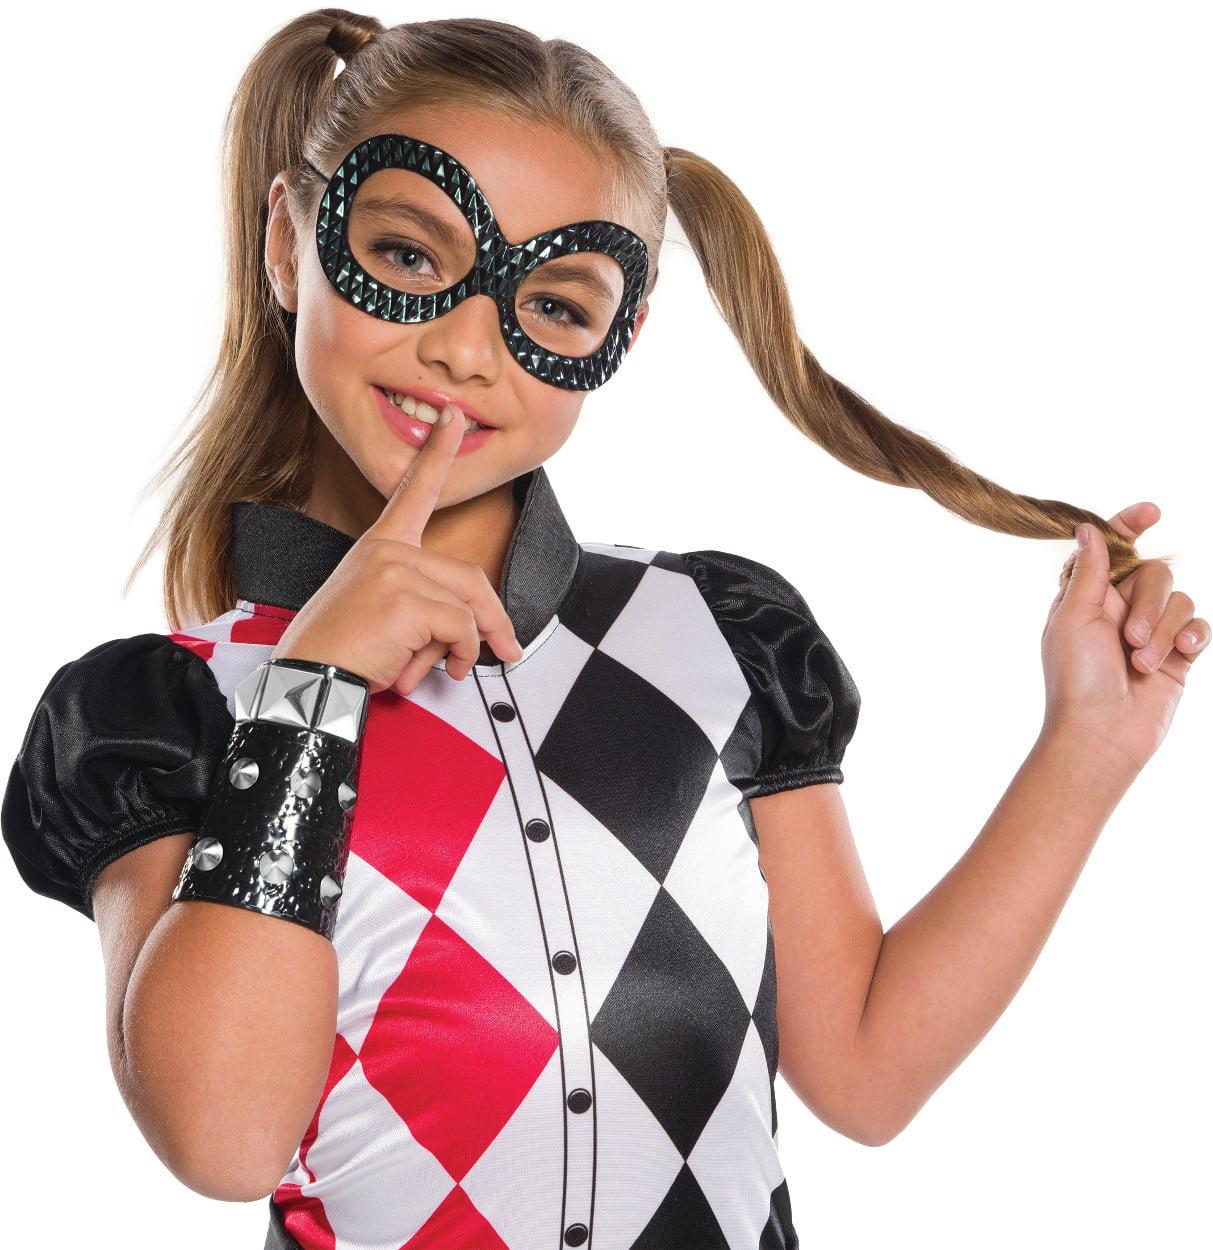 Girl's DC Super Hero Girls Harley Quinn Costume Accessory Kit by Rubies Costume Co